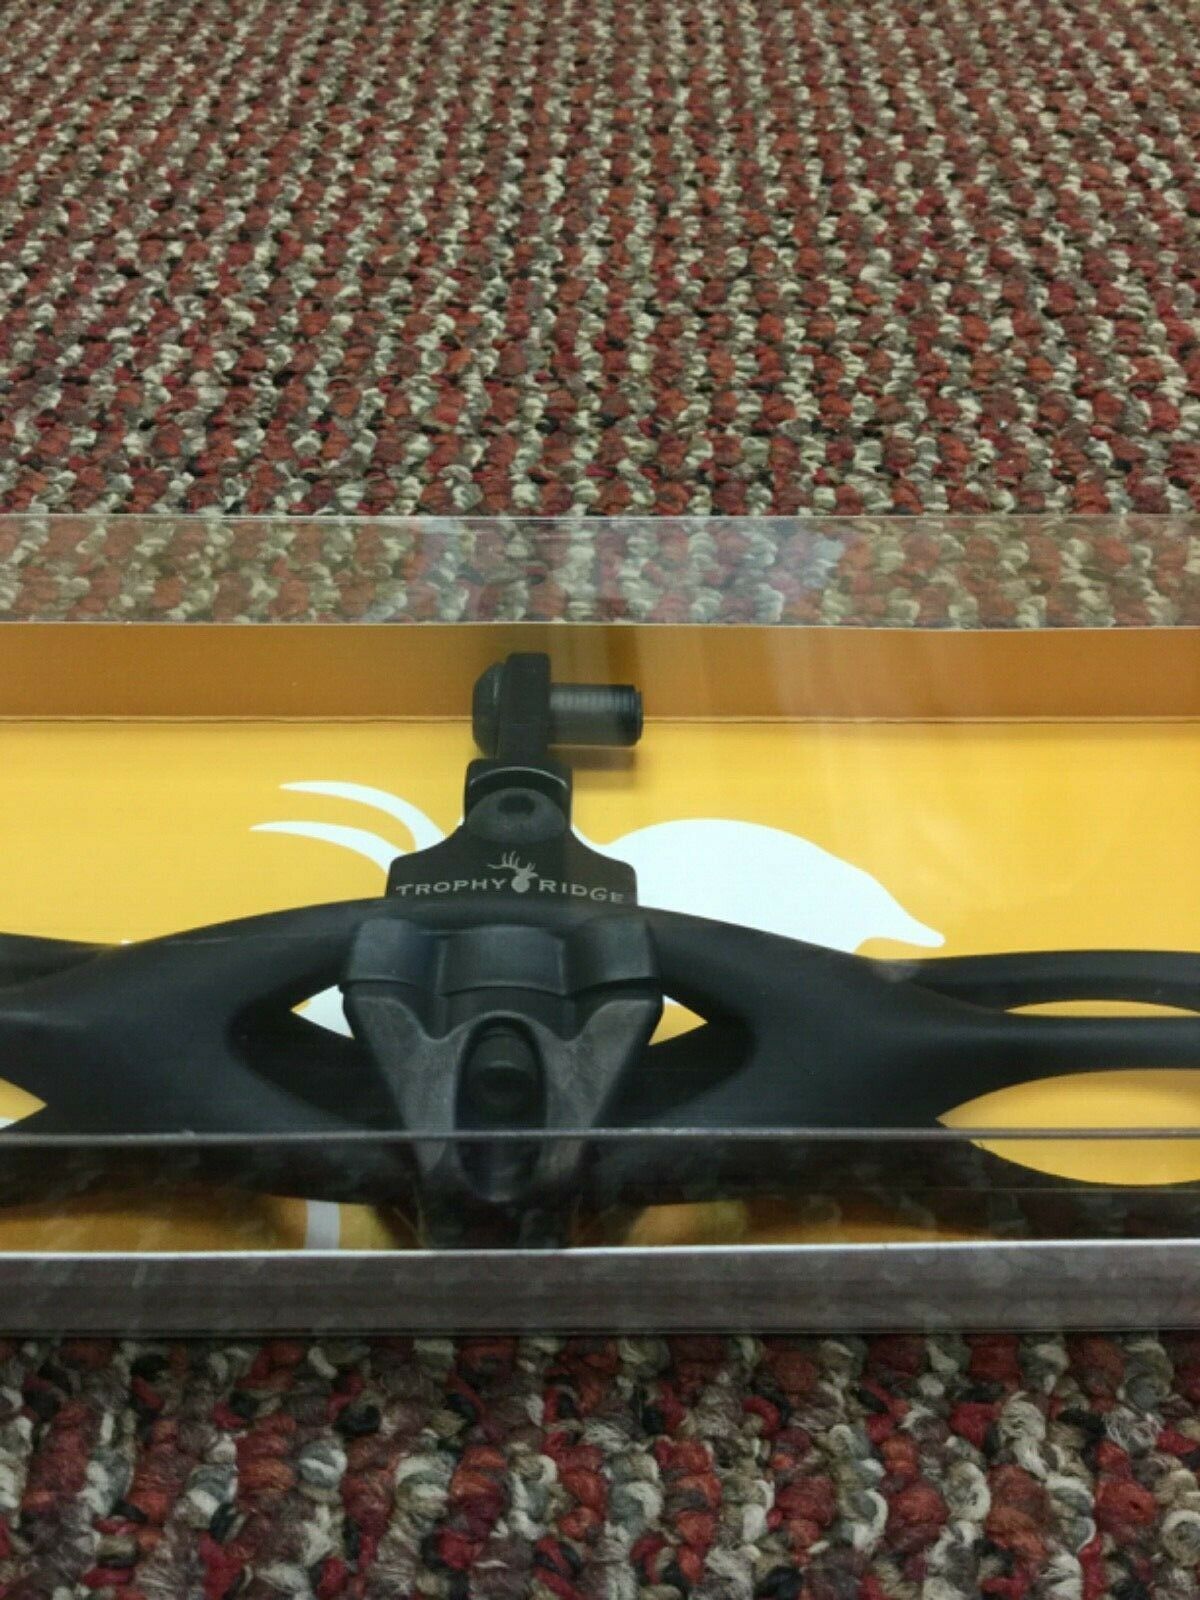 Trophy Ridge Static XS Sidebar Stabilizer Black #AS1400B